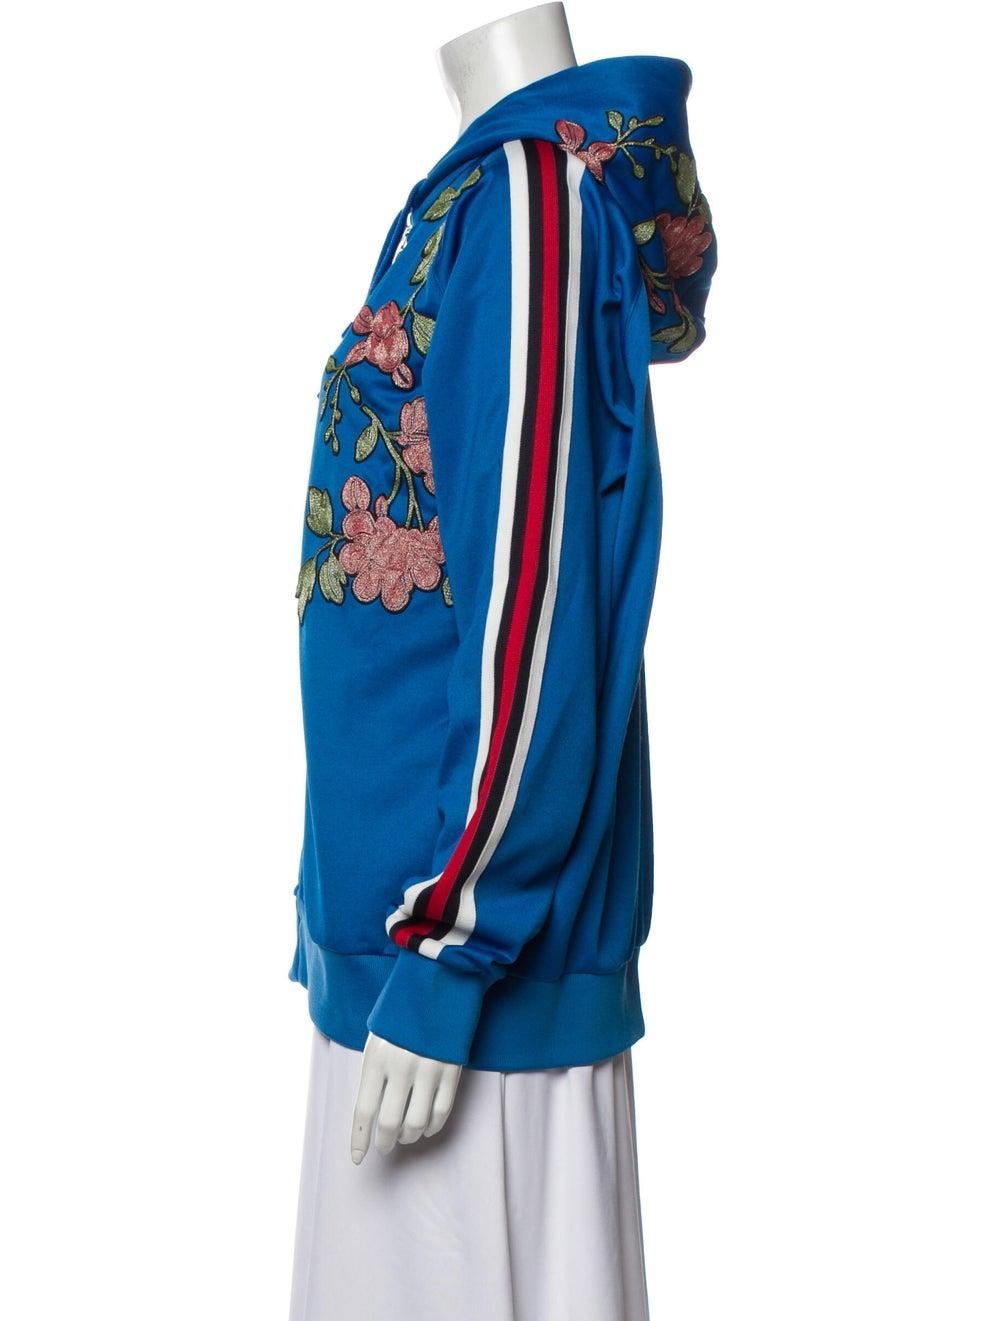 Gucci 2017 Floral Print Sweatshirt Sweatshirt Blue - image 2